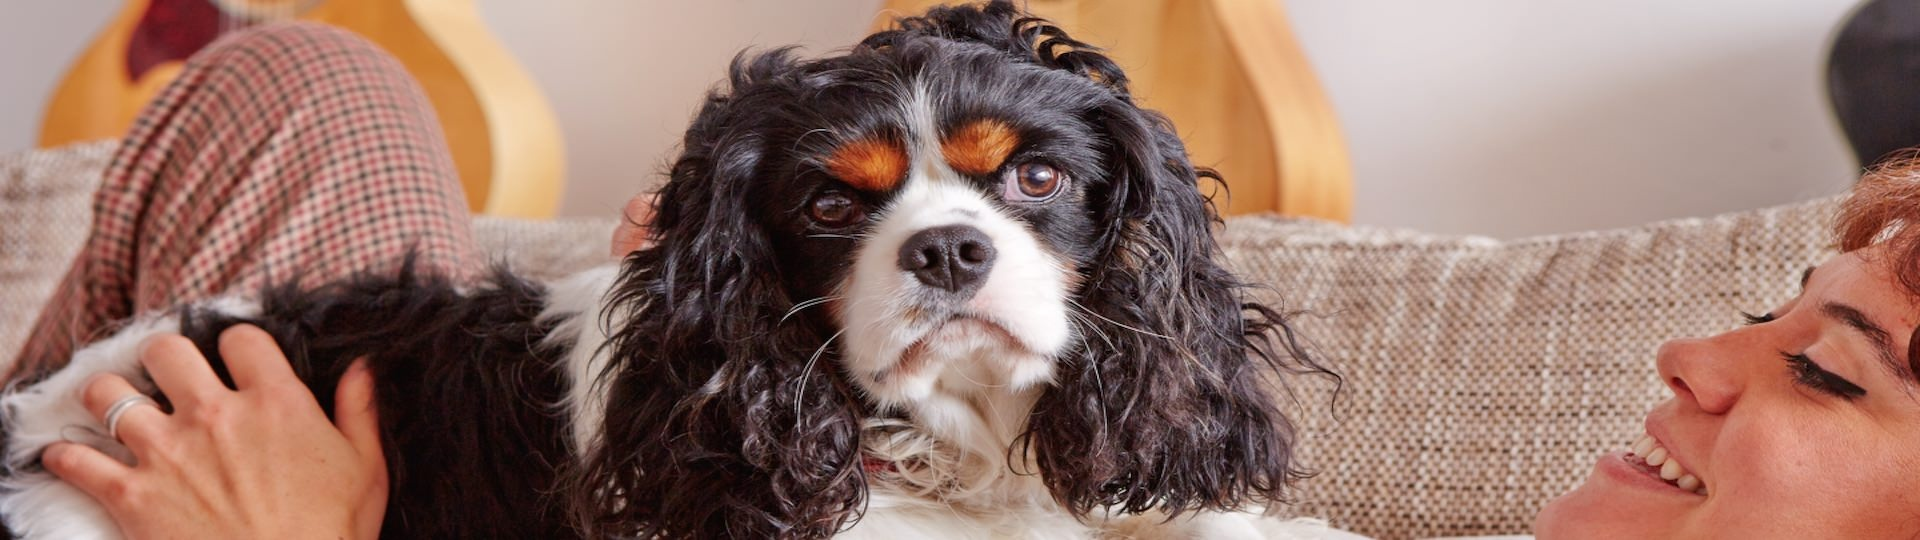 Adaptil helps dogs learn, settle, travel